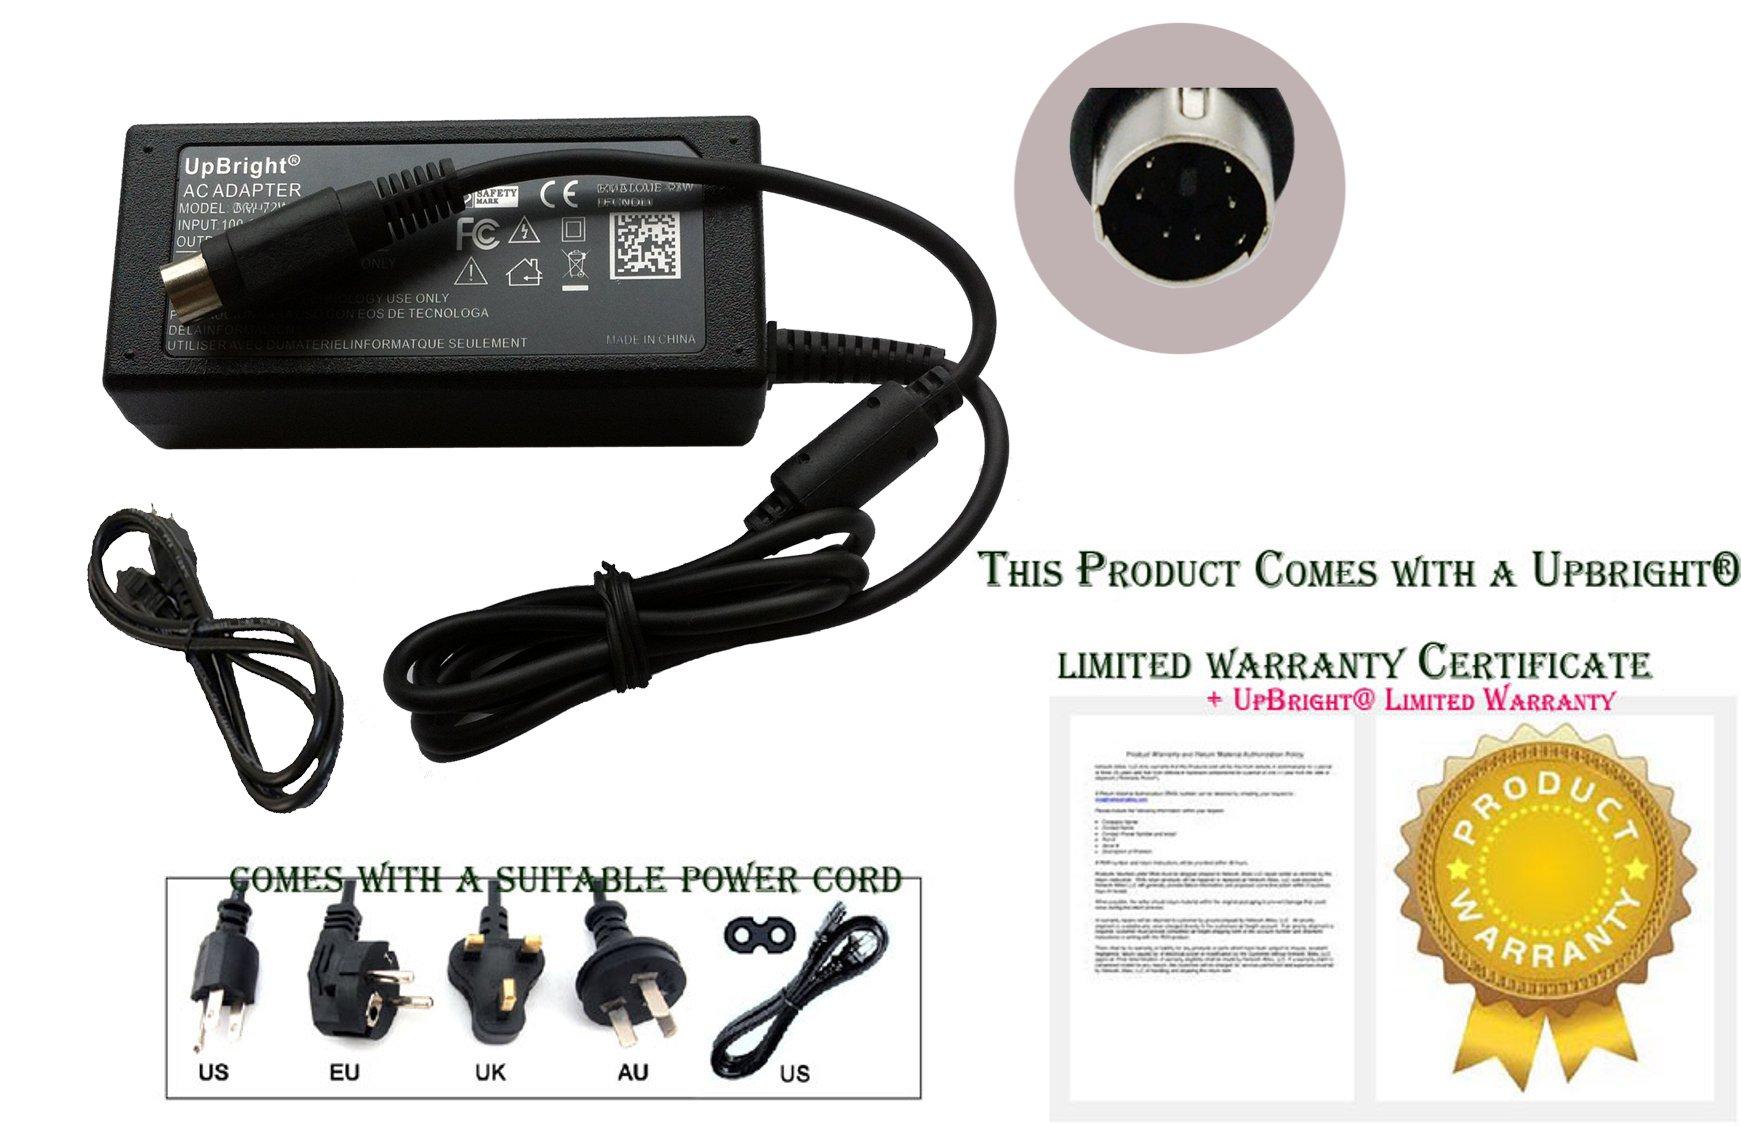 UpBright Mini 6-Pin Metal DIN Connector AC / DC Adapter For APD Iomega DA-30C03 DA-30C01 30941701 DA30C03 DA30C01 Asian Power Devices Hard Disk Drive HDD HD 5V 12V 12.0V 5.0V 1.5A 2A Power Supply PSU